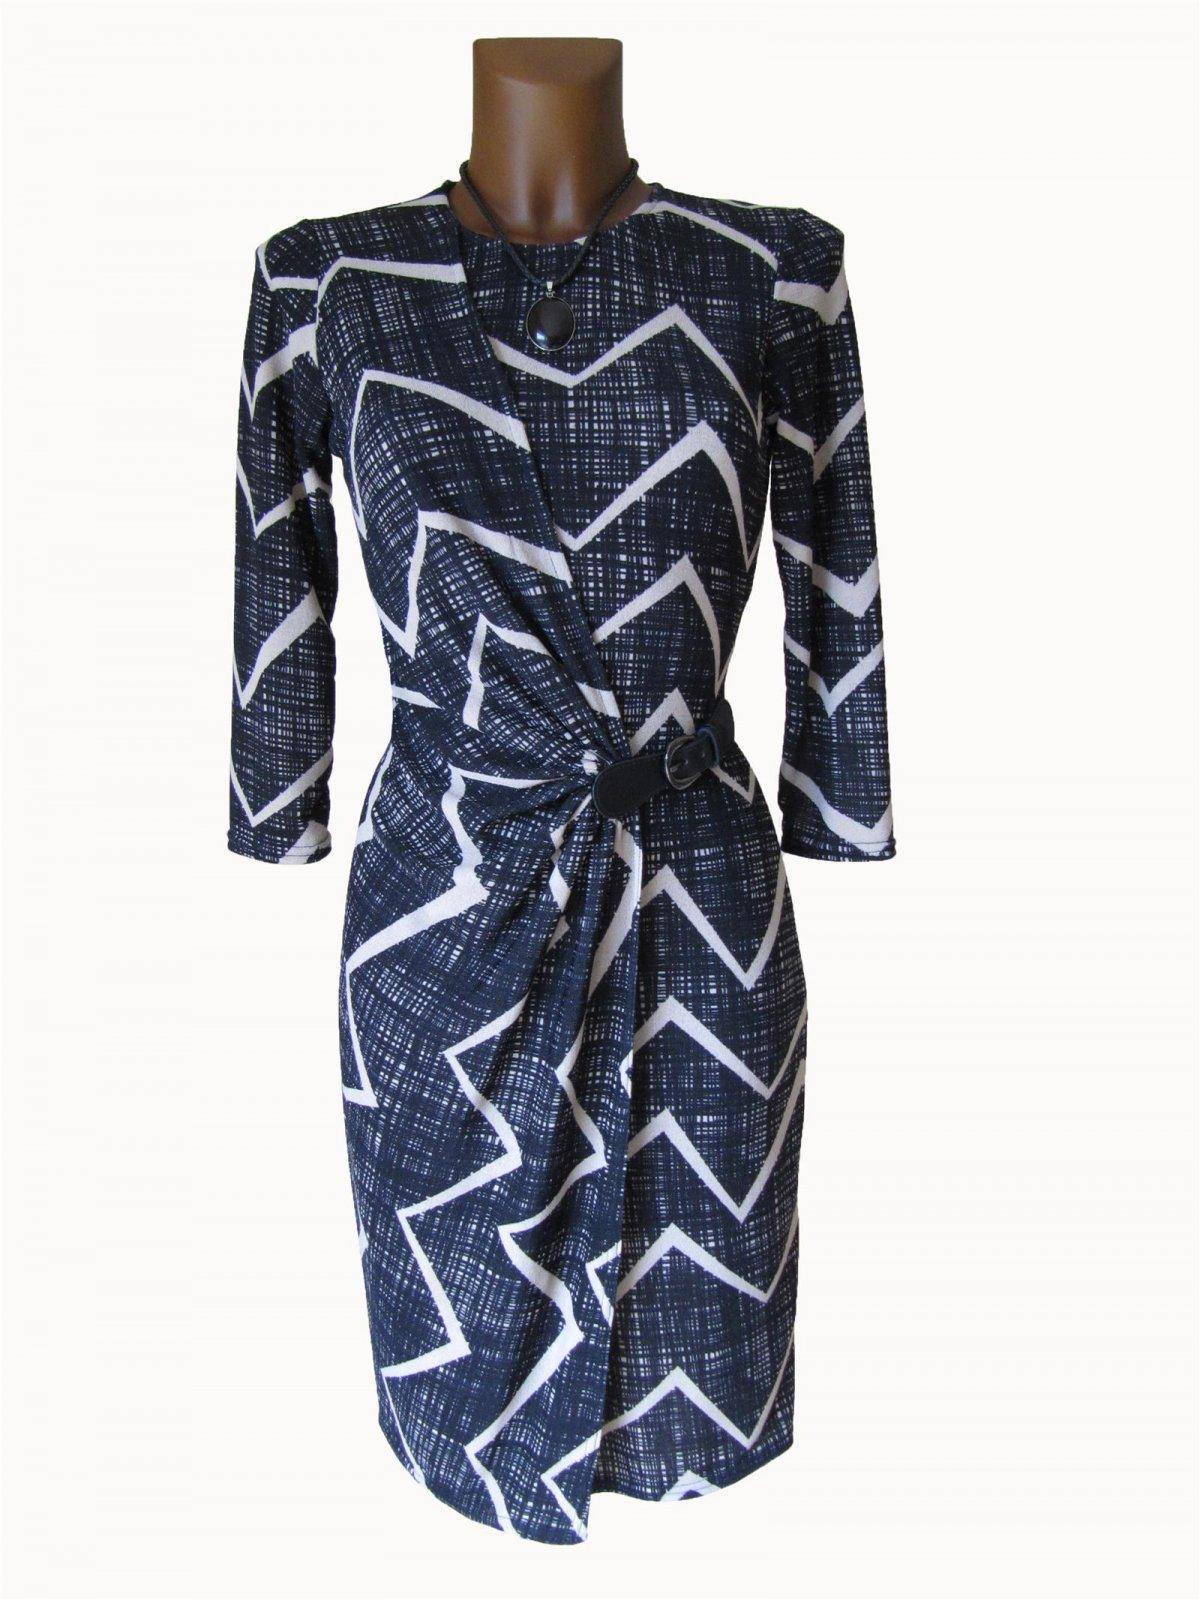 0f4e0310834 Edles Wickelkleid Kleid Tunika Falten Gürtel Optik Zick Zack schwarz beige  36 38